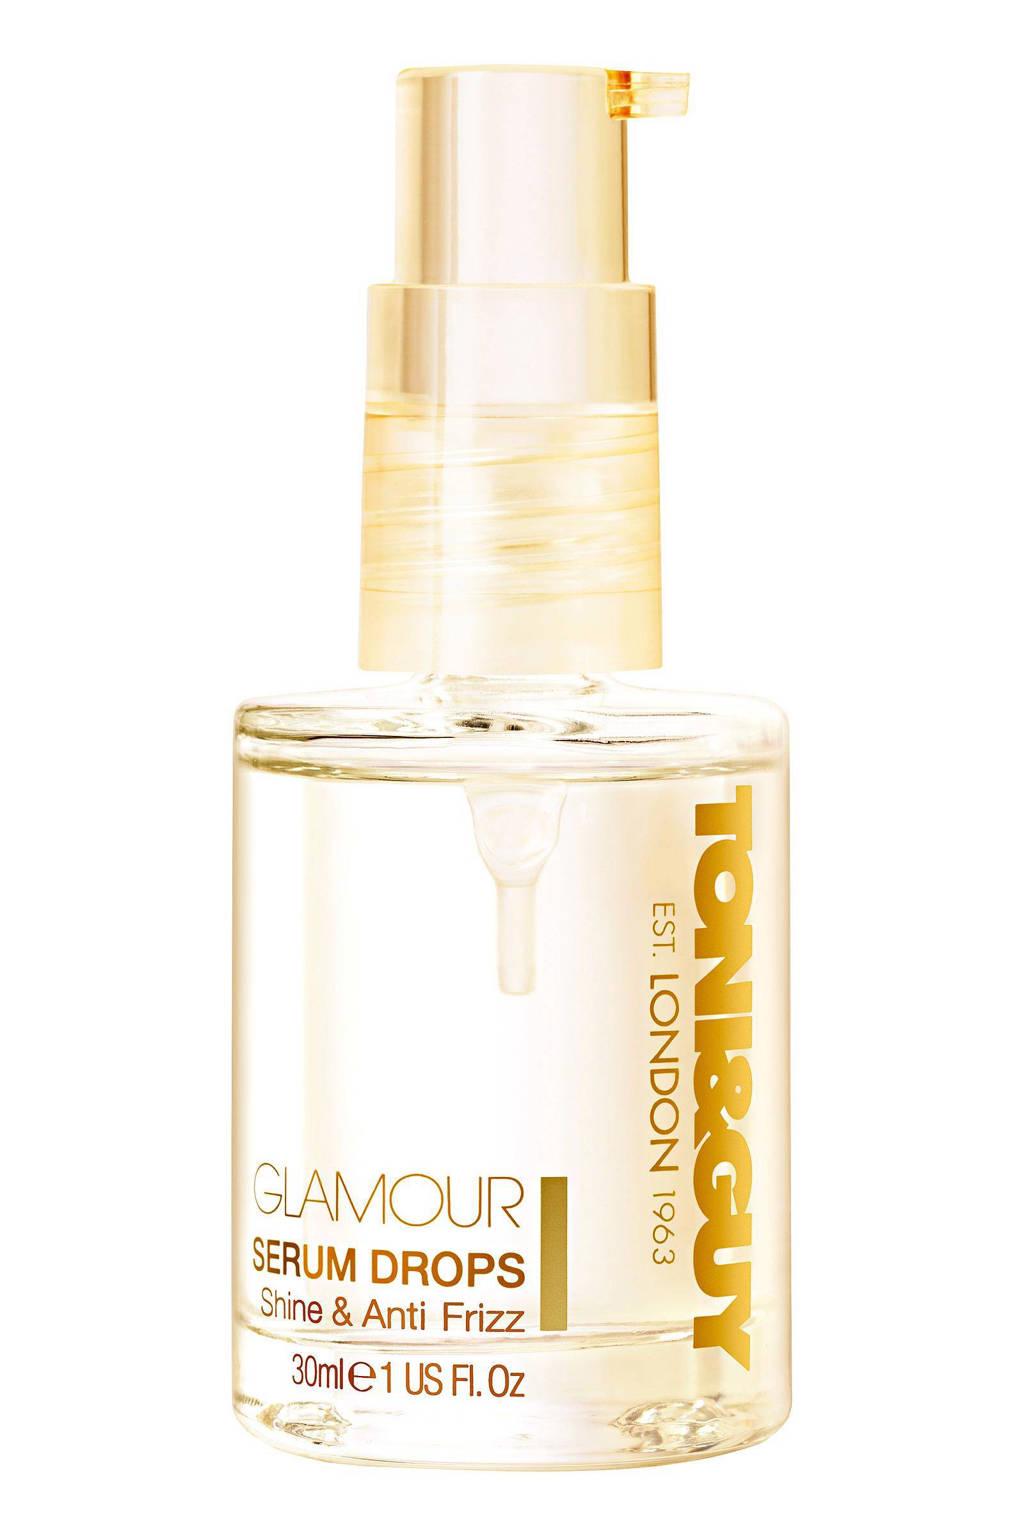 TONI&GUY Shine & Anti-Frizz Glamour - 30 ml - Serum